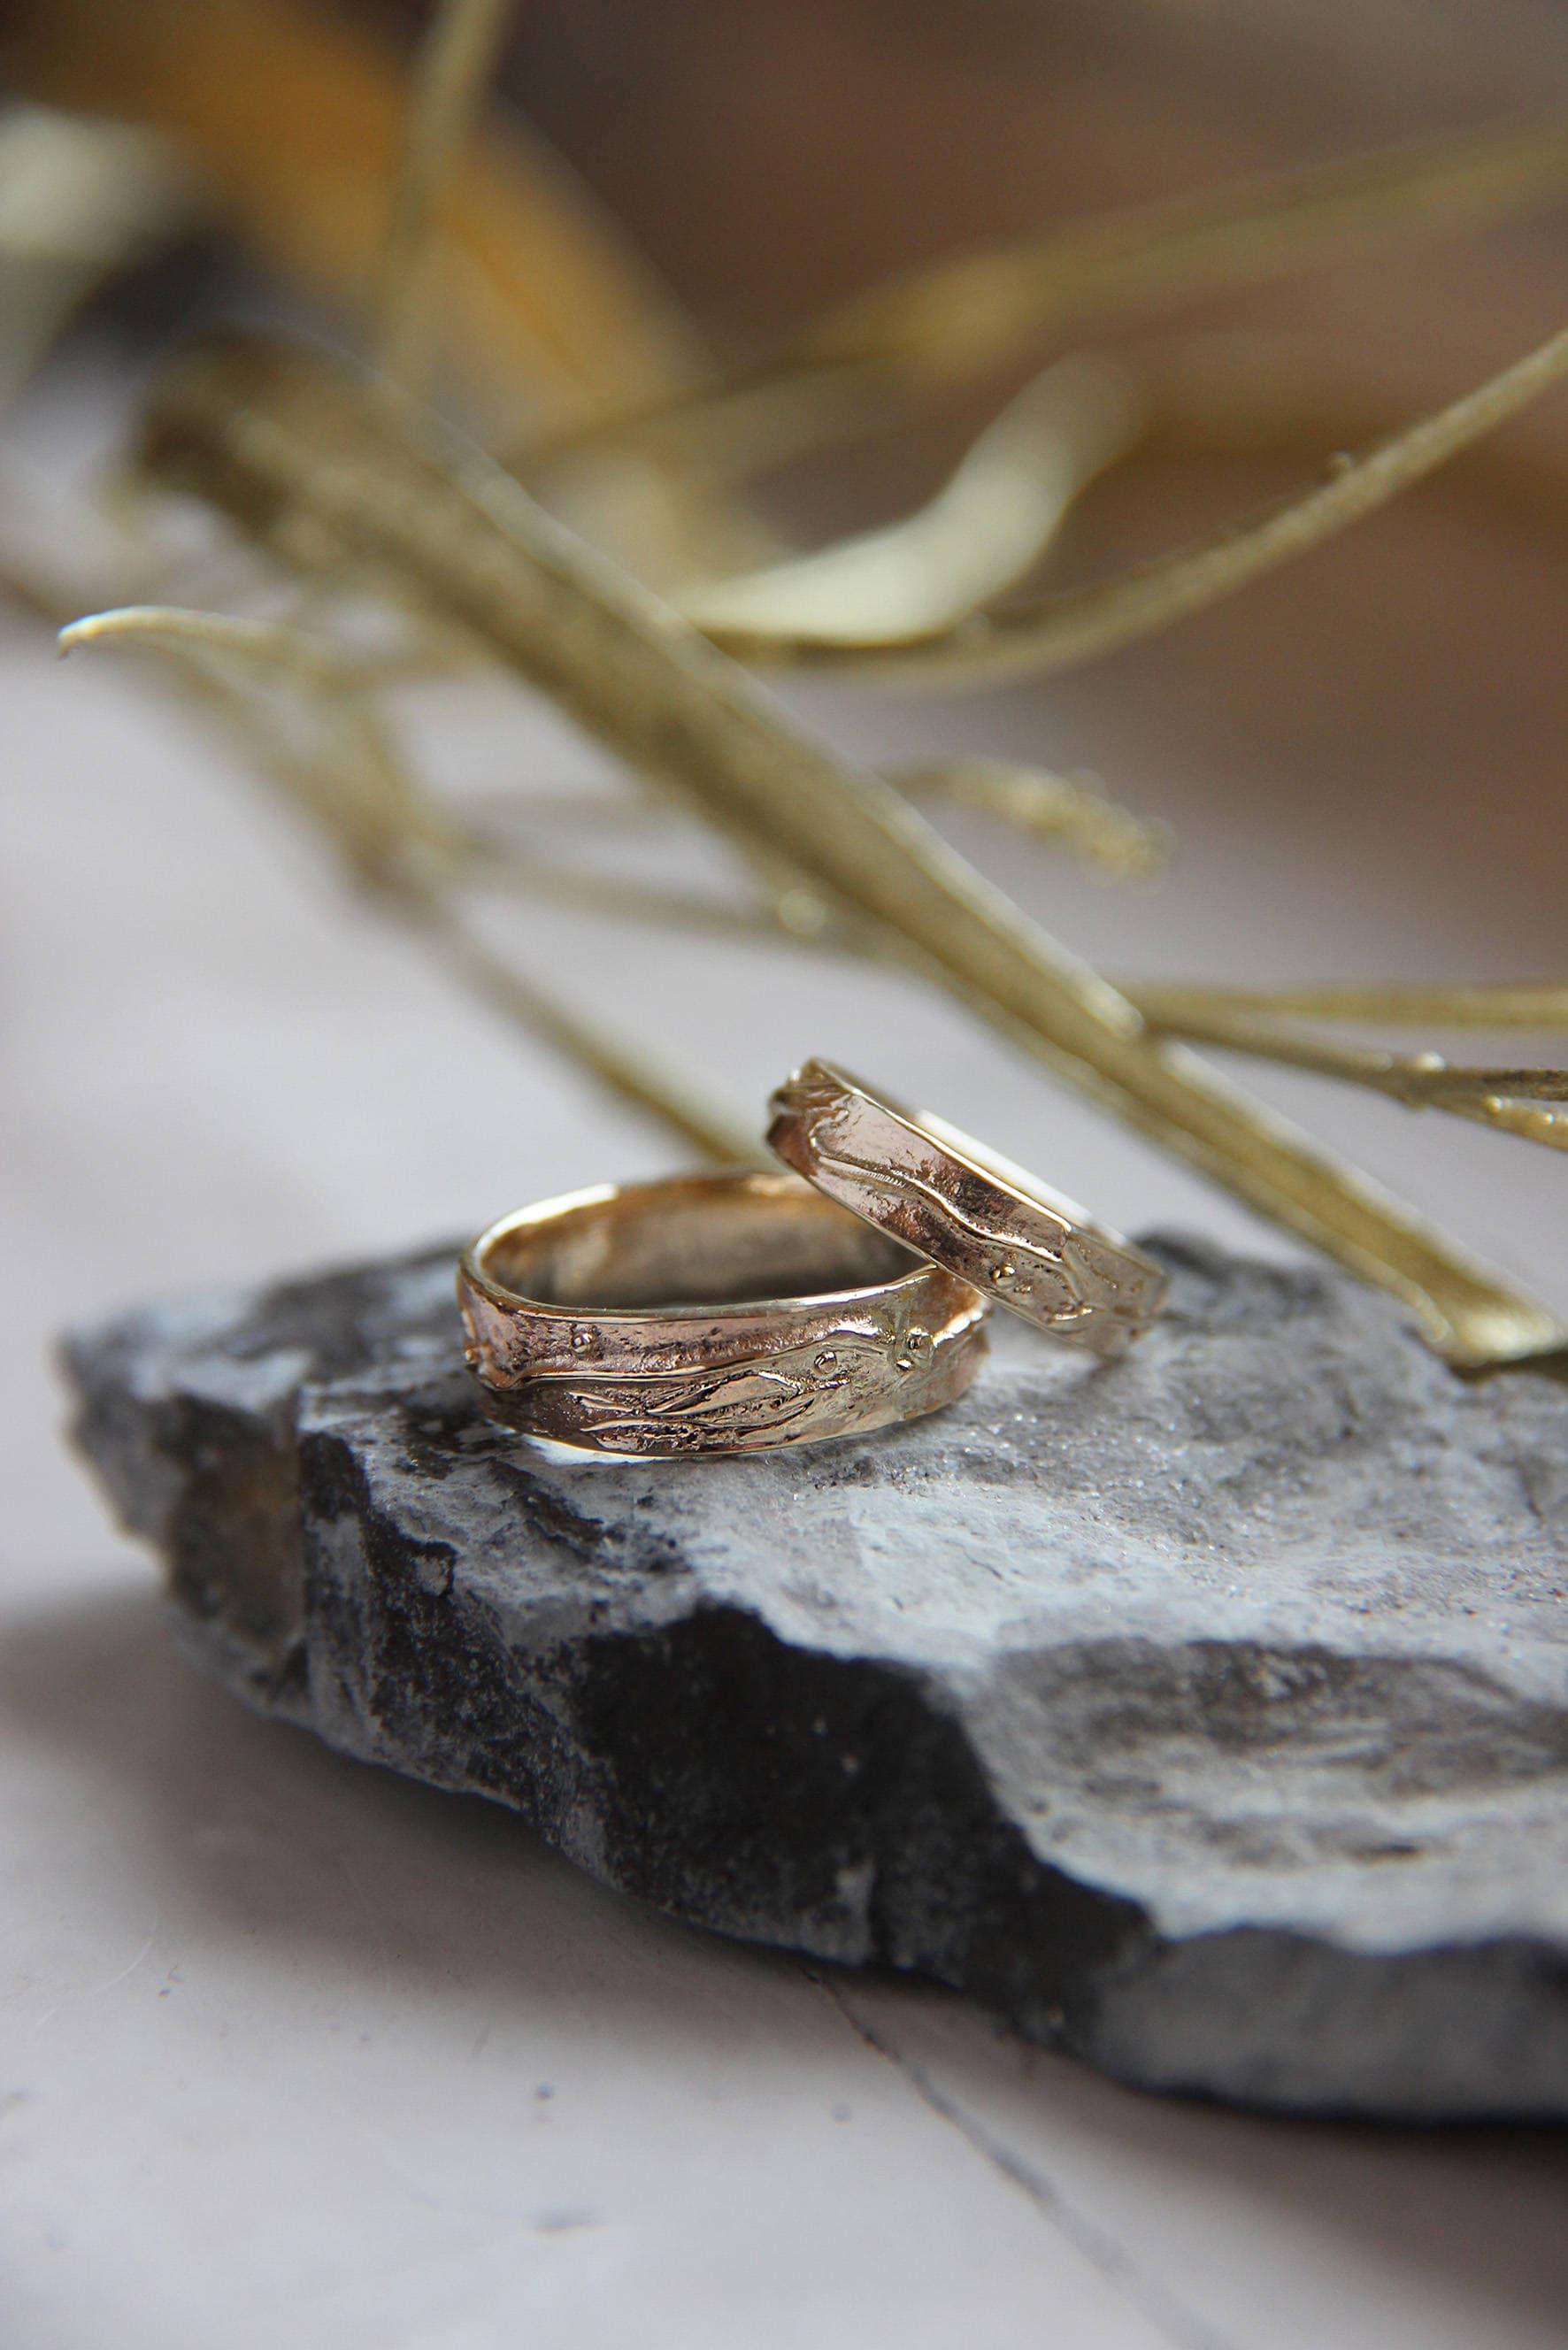 Perky Wedding G Wedding Textured Wedding Wedding Wedding Band Rustic Wedding Ring Wedding G Wedding Textured Wedding Ring Wedding Rings San Francisco Wedding Rings Cheap wedding rings Unique Wedding Rings